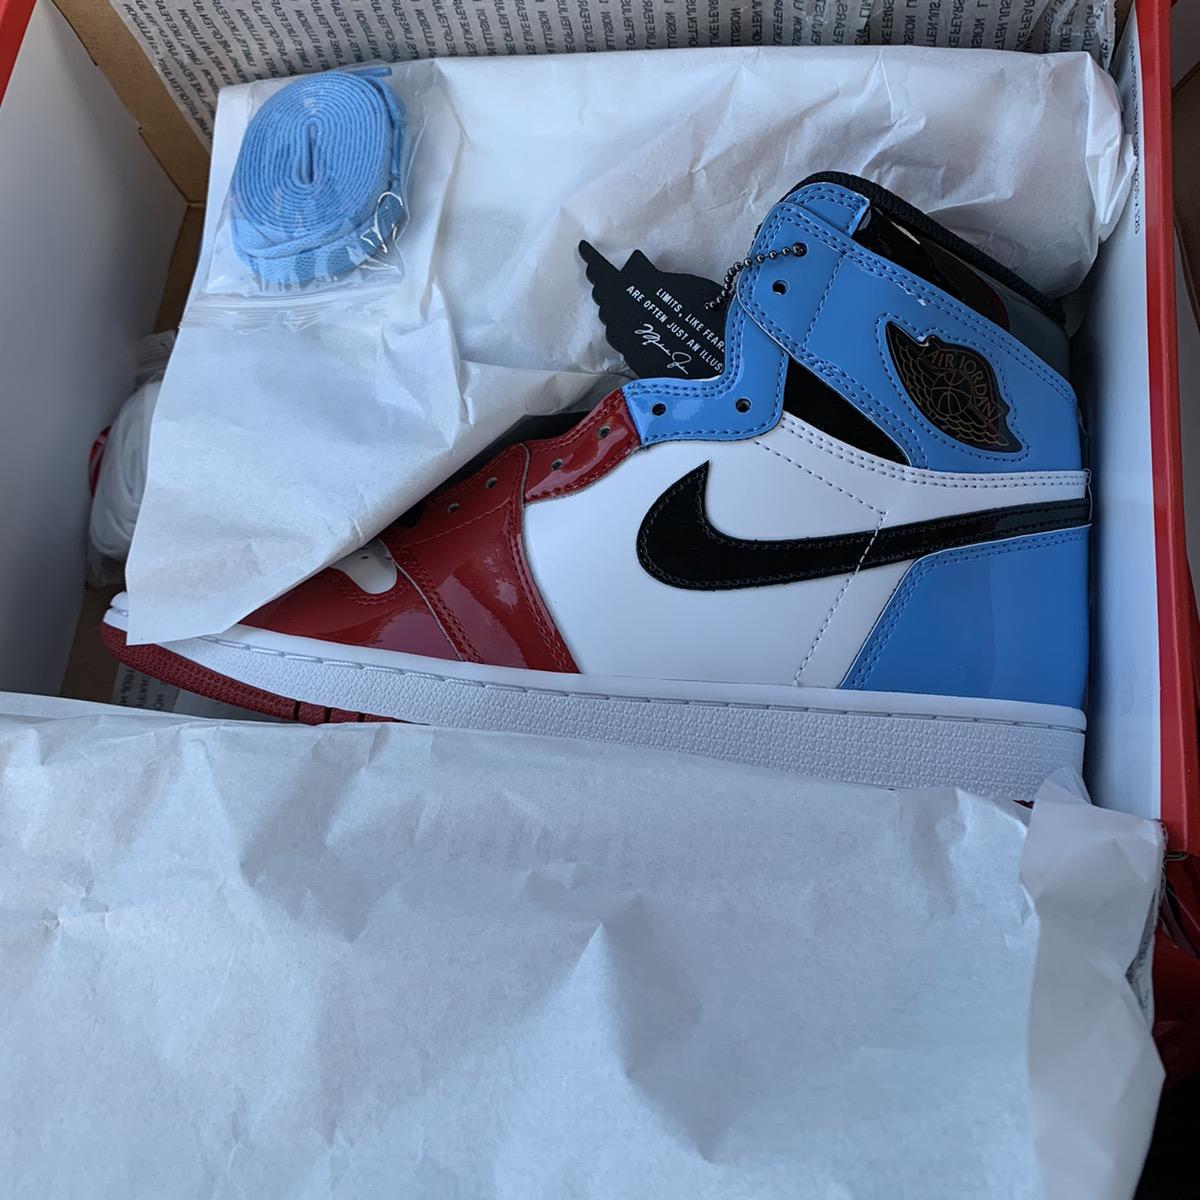 Air Jordan 1 Retro High OG Fearless unc Chicago men size 9